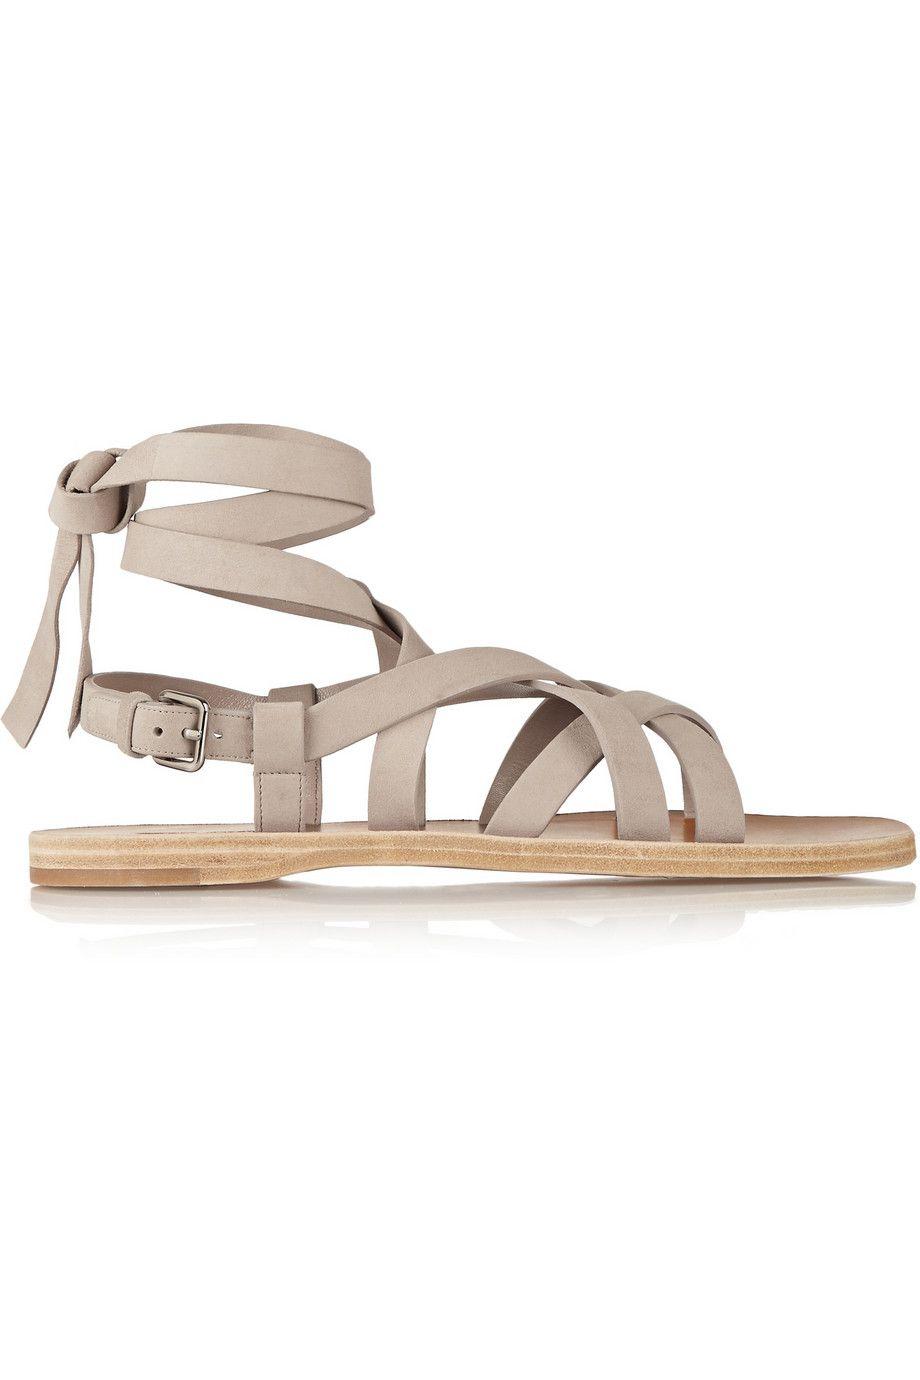 Chaussures - Sandales Entredoigt Miu Miu xeYAfm